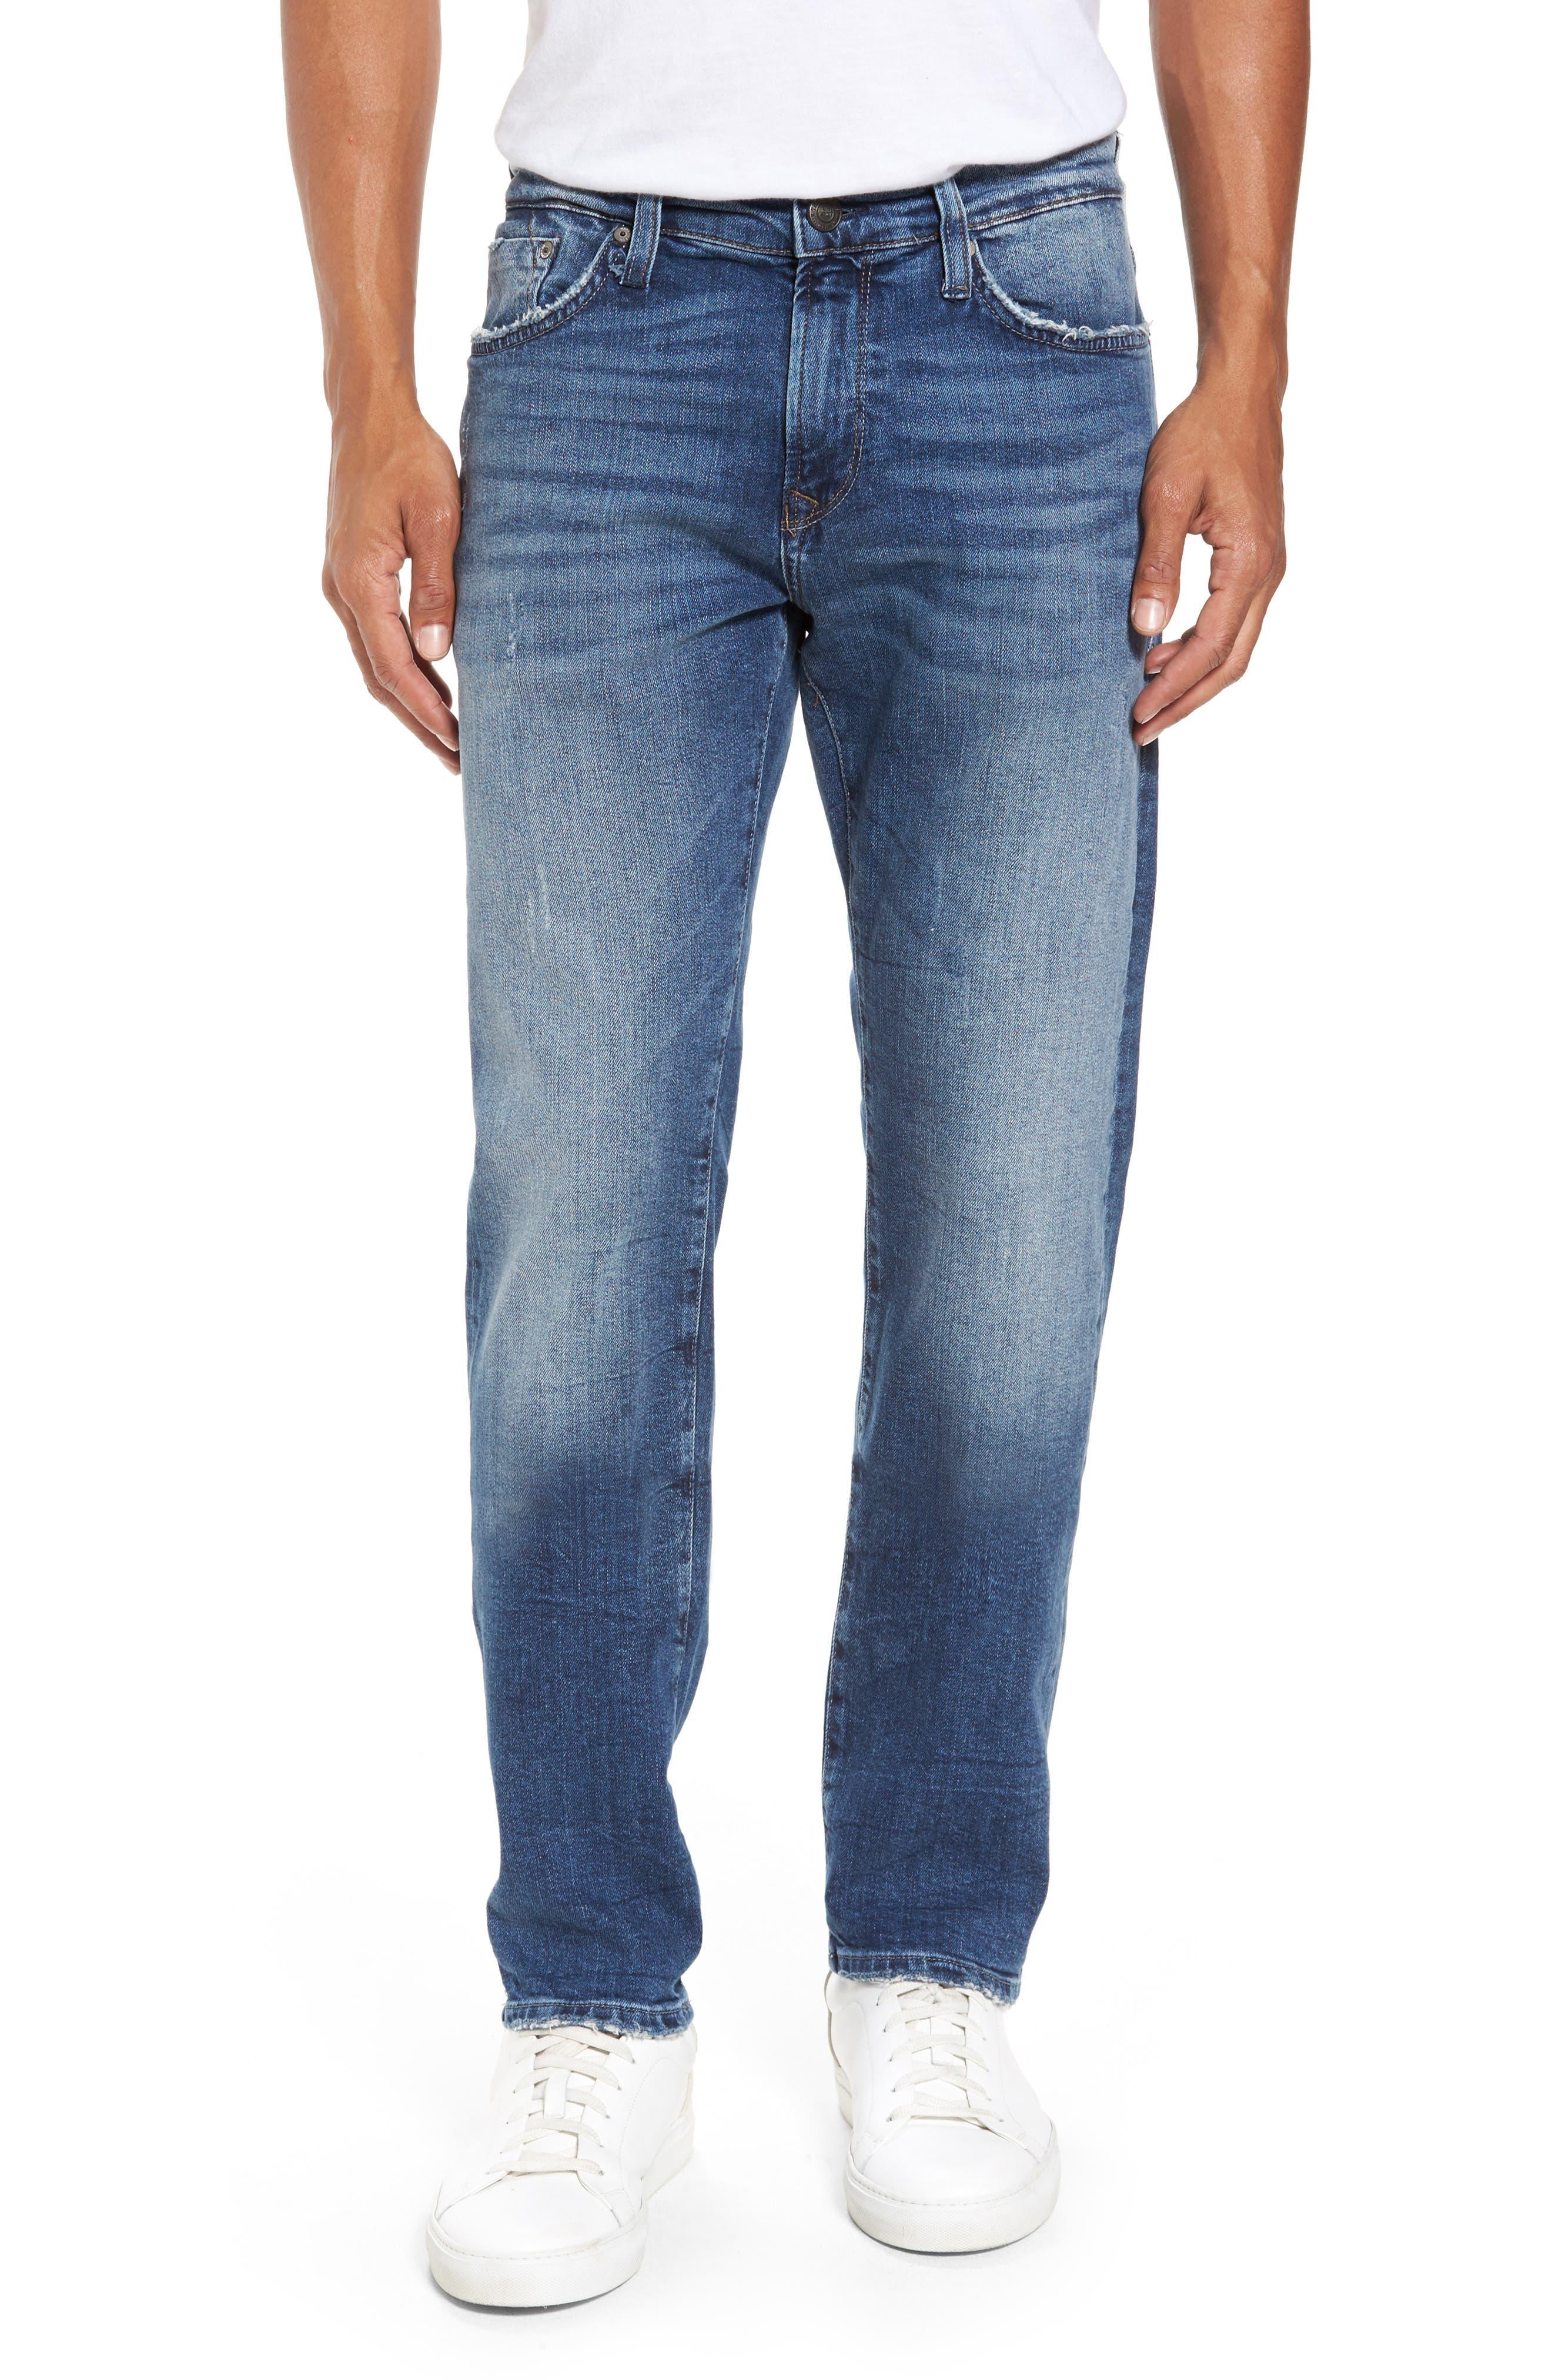 Alternate Image 1 Selected - Mavi Jeans Marcus Slim Straight Leg Jeans (Destroyed Authentic Vintage)